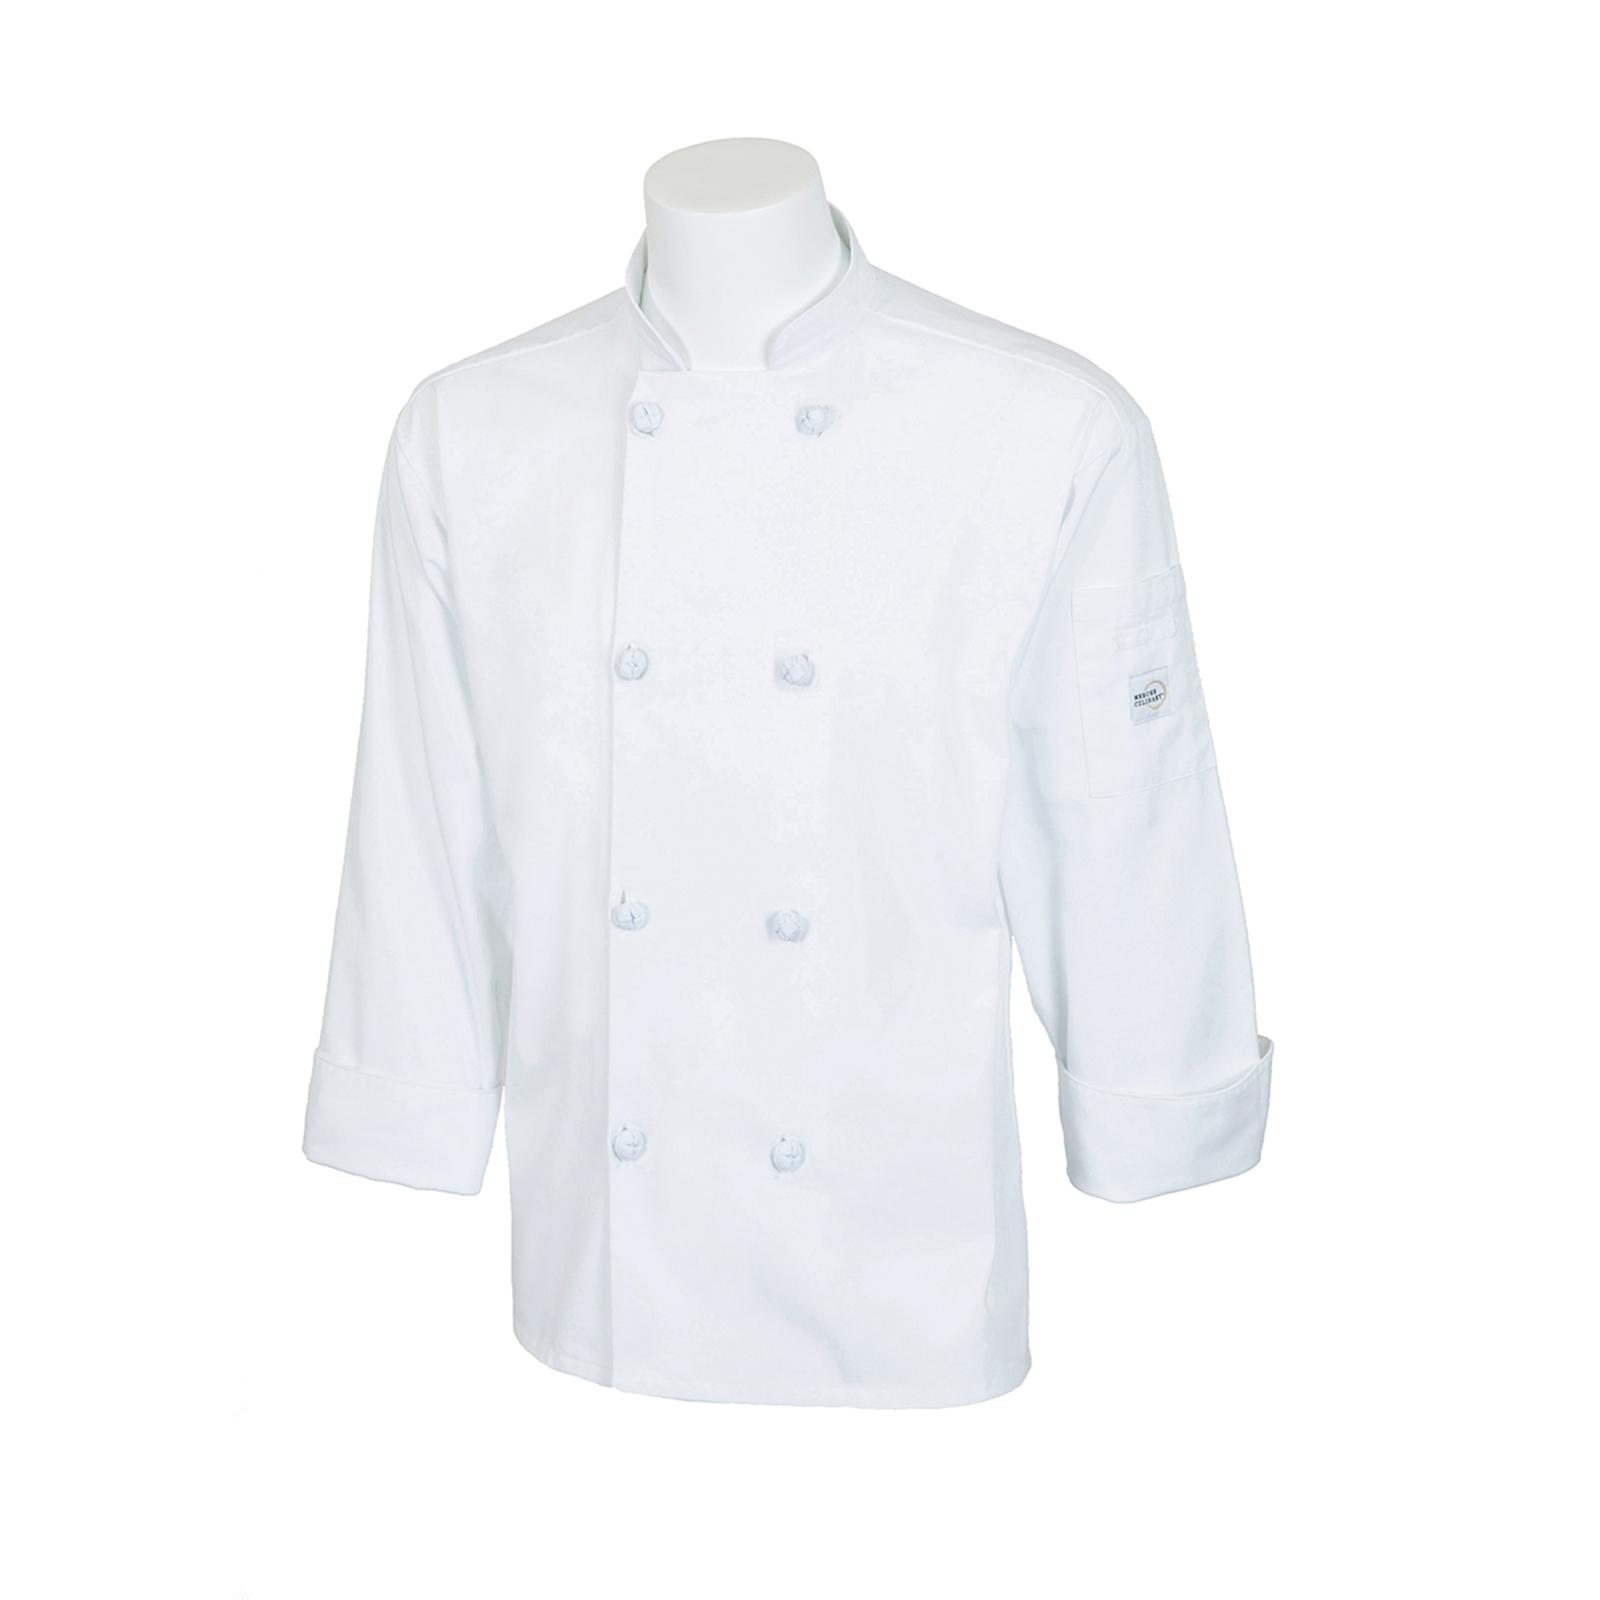 Mercer Culinary M60012WHM chef's coat